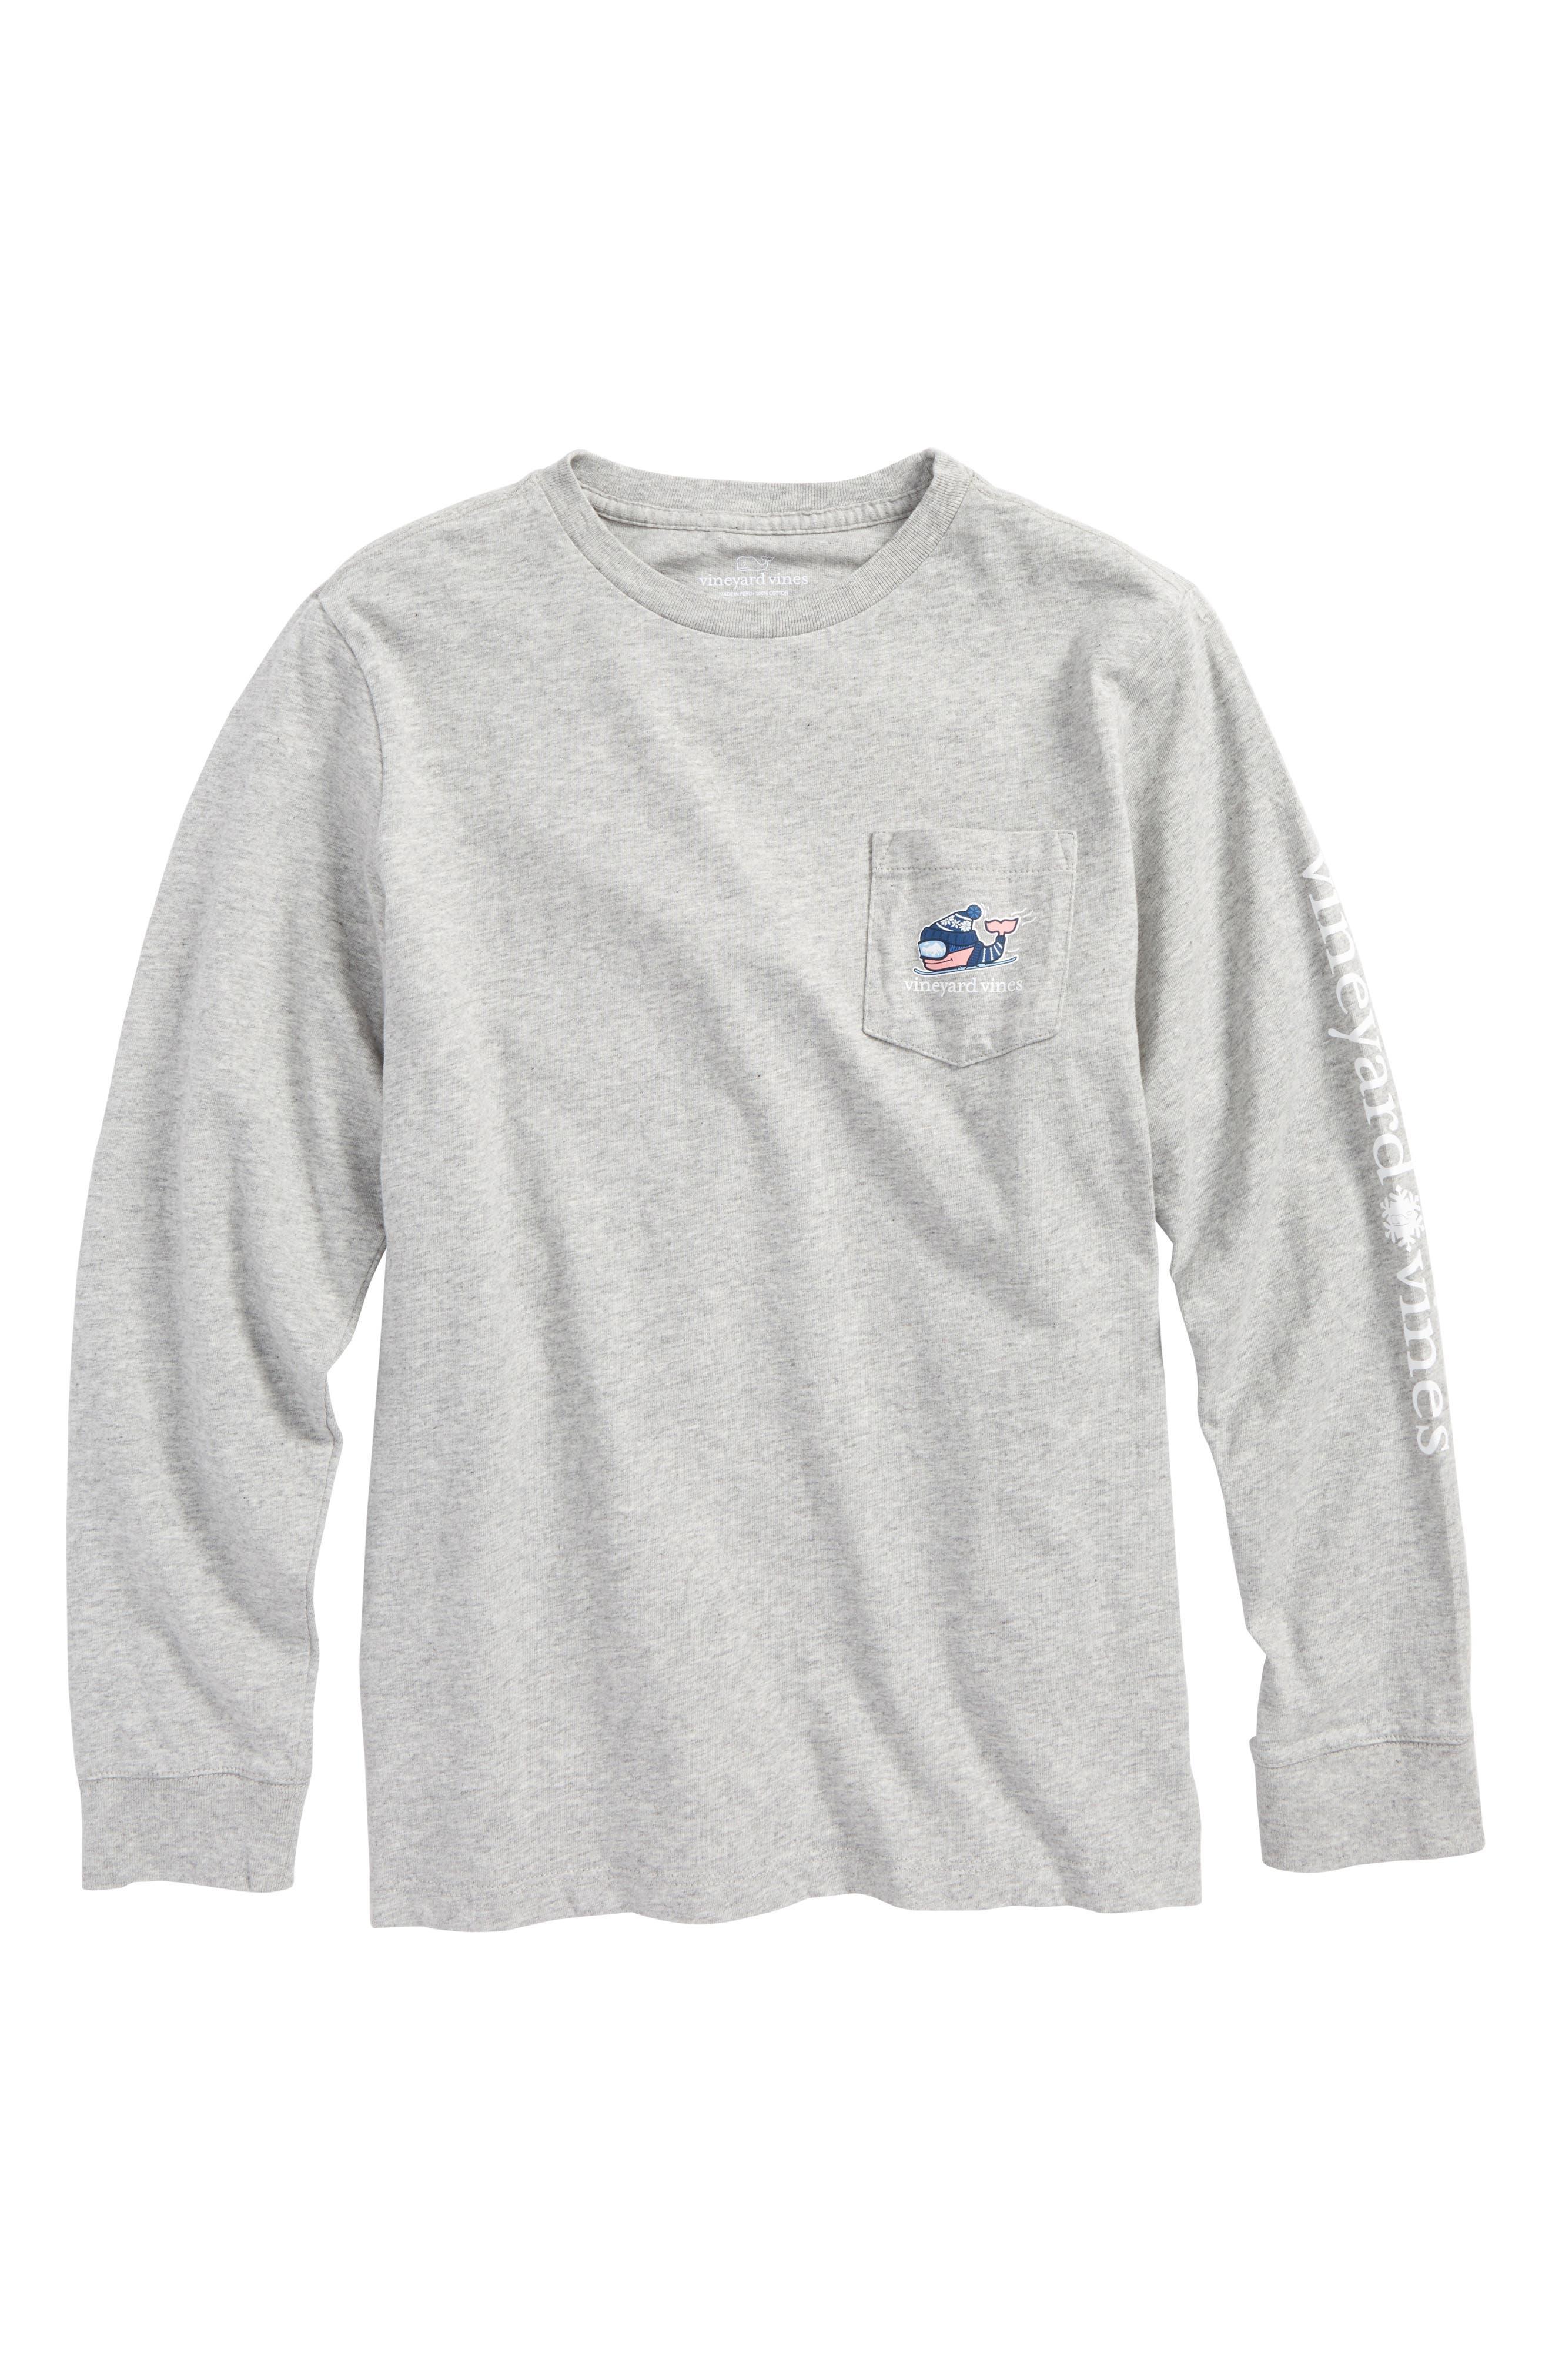 Downhill Ski Whale Pocket T-Shirt, Main, color, 039